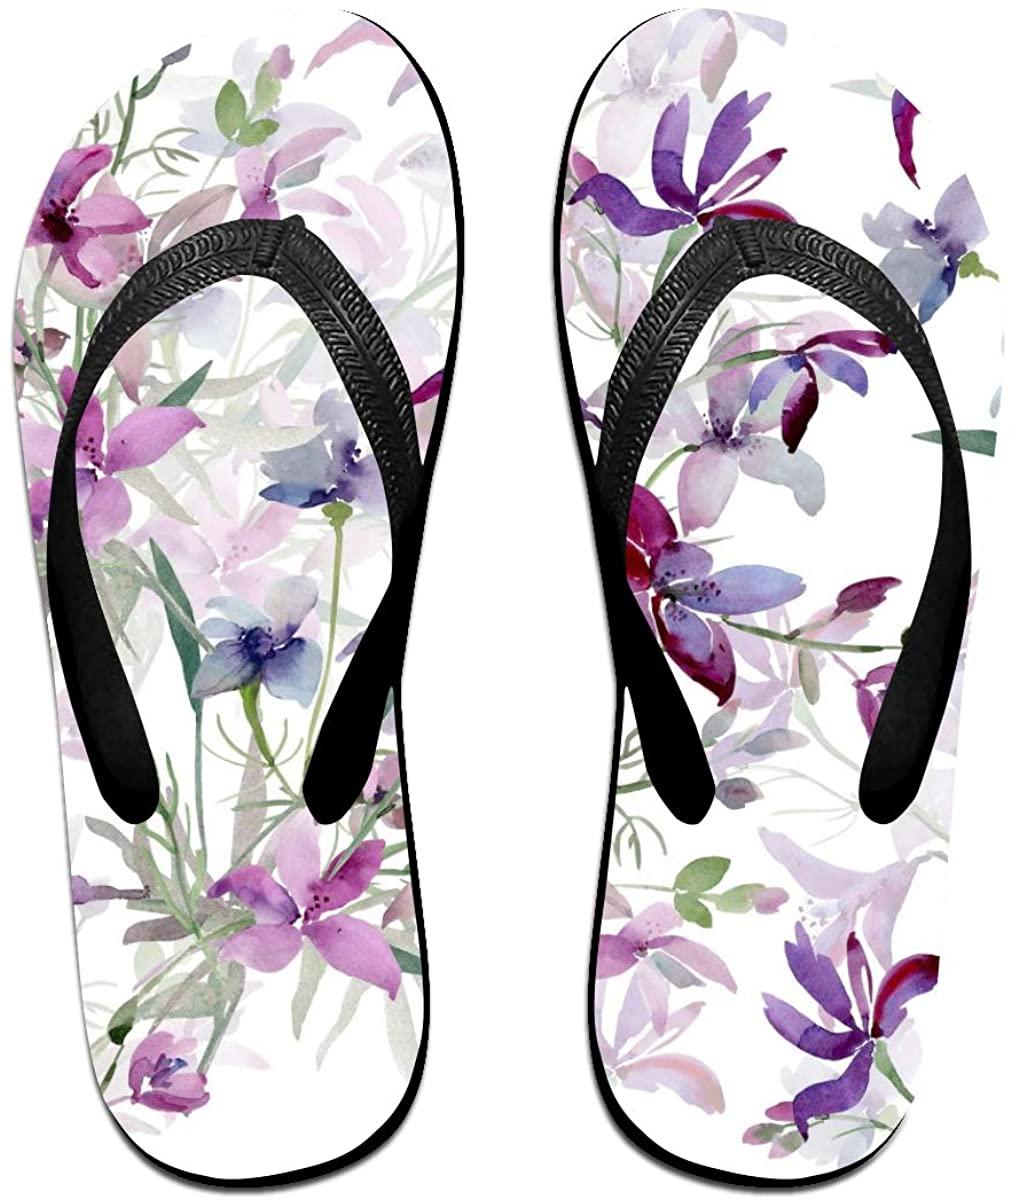 Mens Flip Flop Slippers Watercolor Wild Flowers Floral Rubber Cozy Flip Flops Outdoor Beach Sandals